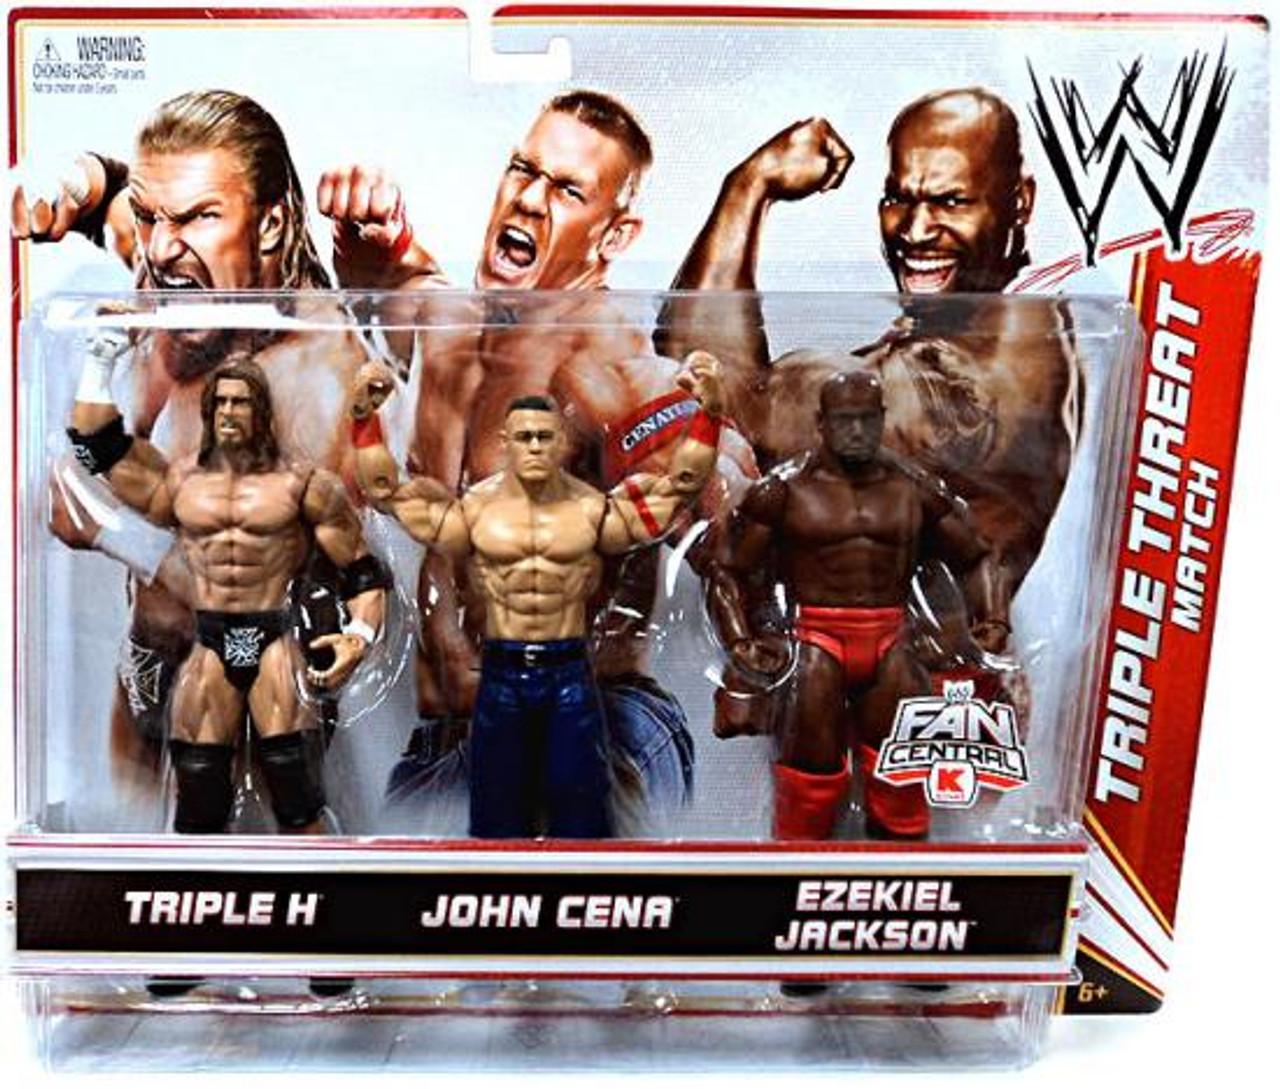 WWE Wrestling Triple H, John Cena & Ezekiel Jackson Exclusive Action Figure 3-Pack [Triple Threat Match]